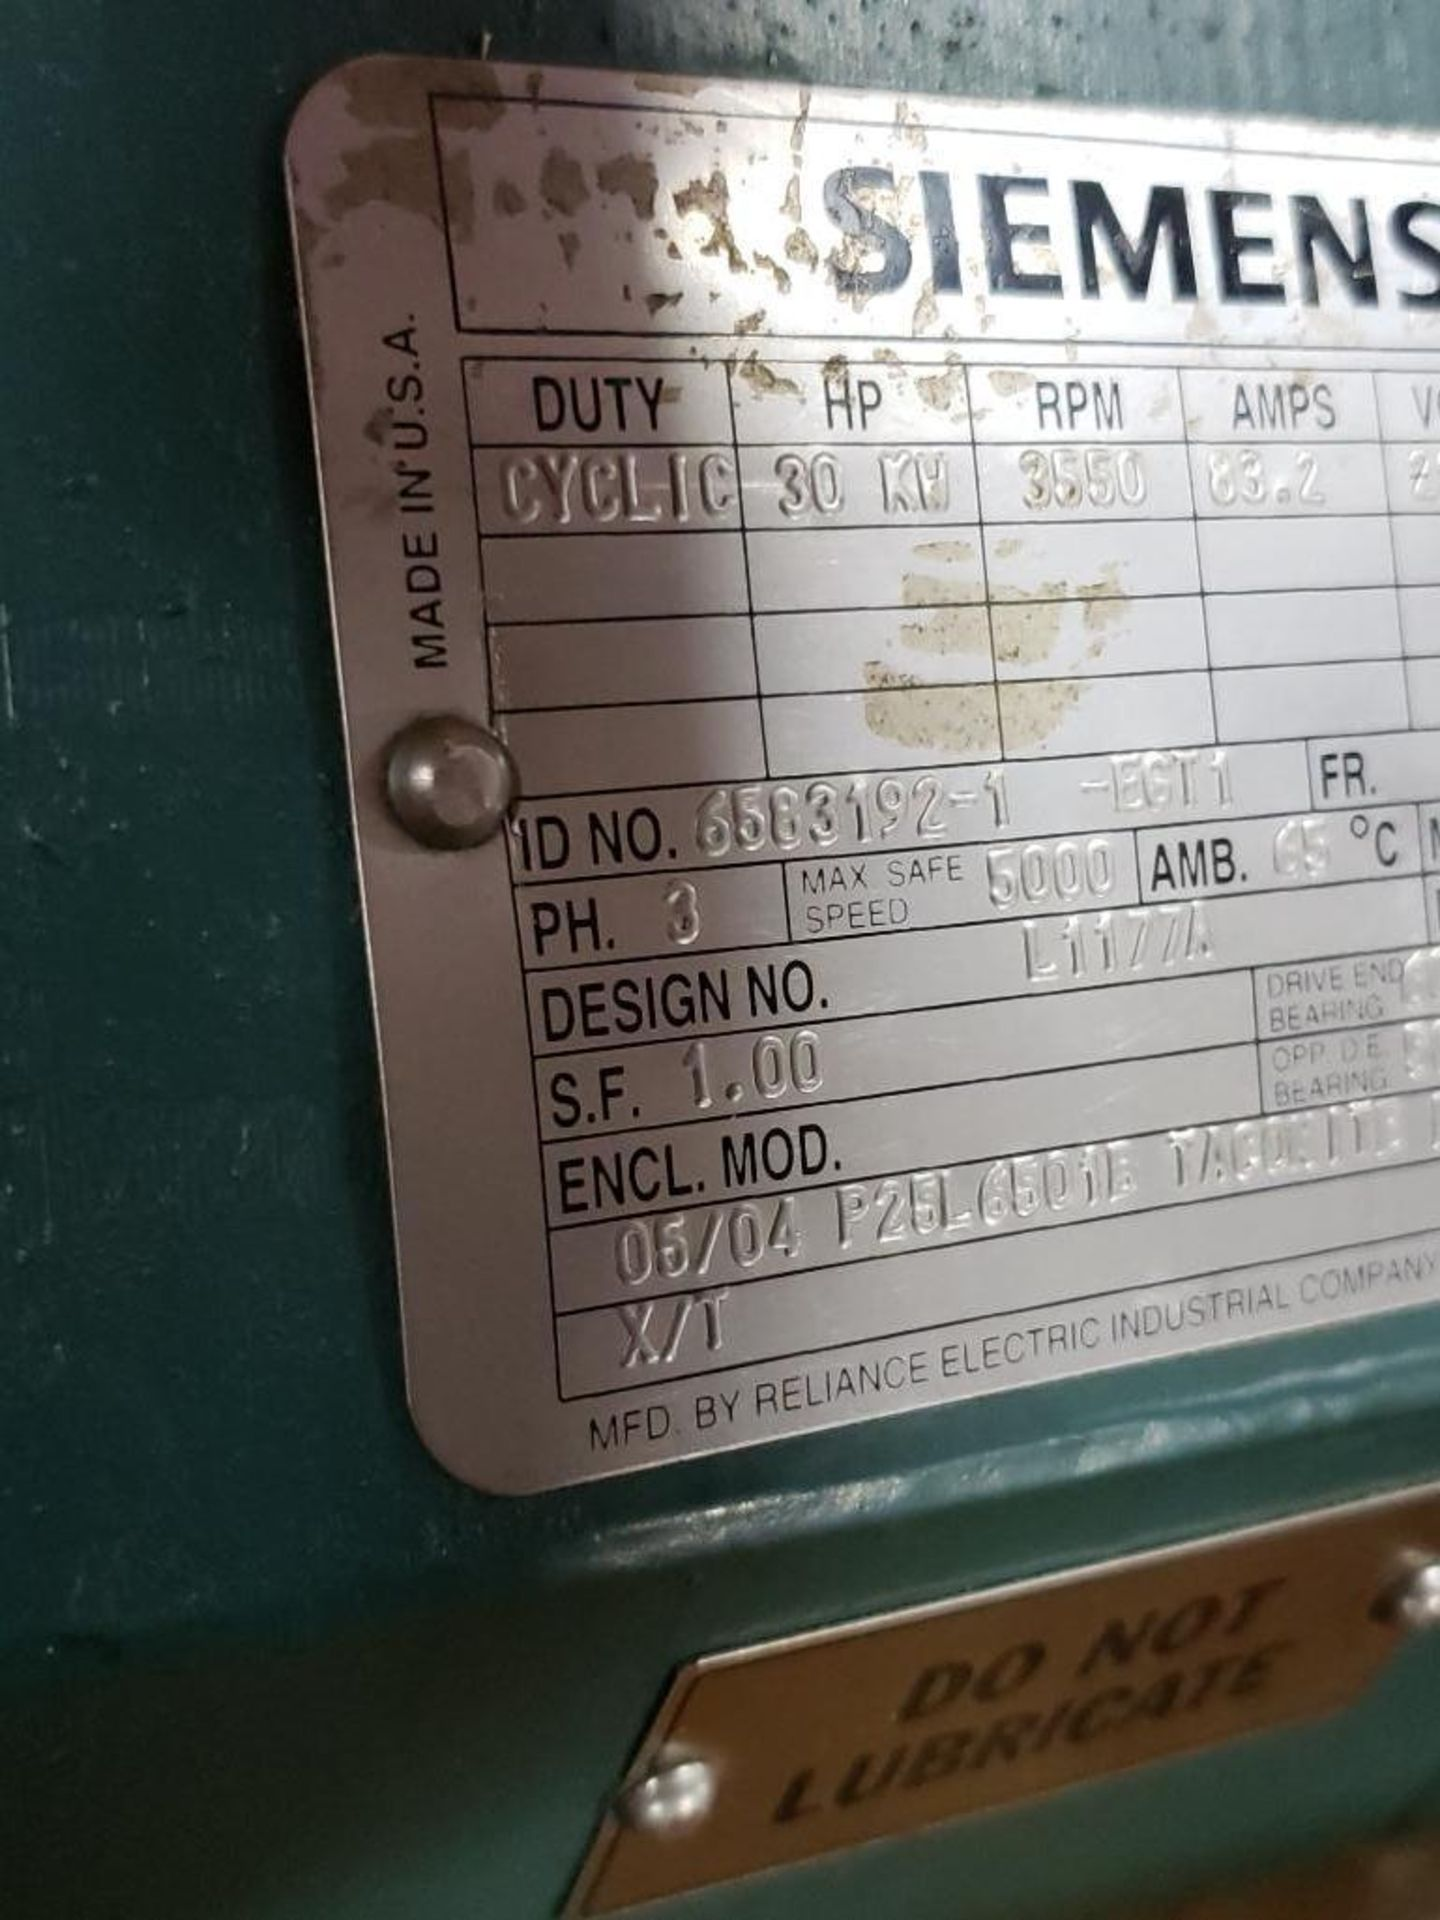 30kW Siemens 3PH Motor. 6583192-1-EGT1. 280V, 3550RM, L2564-Frame. - Image 3 of 7